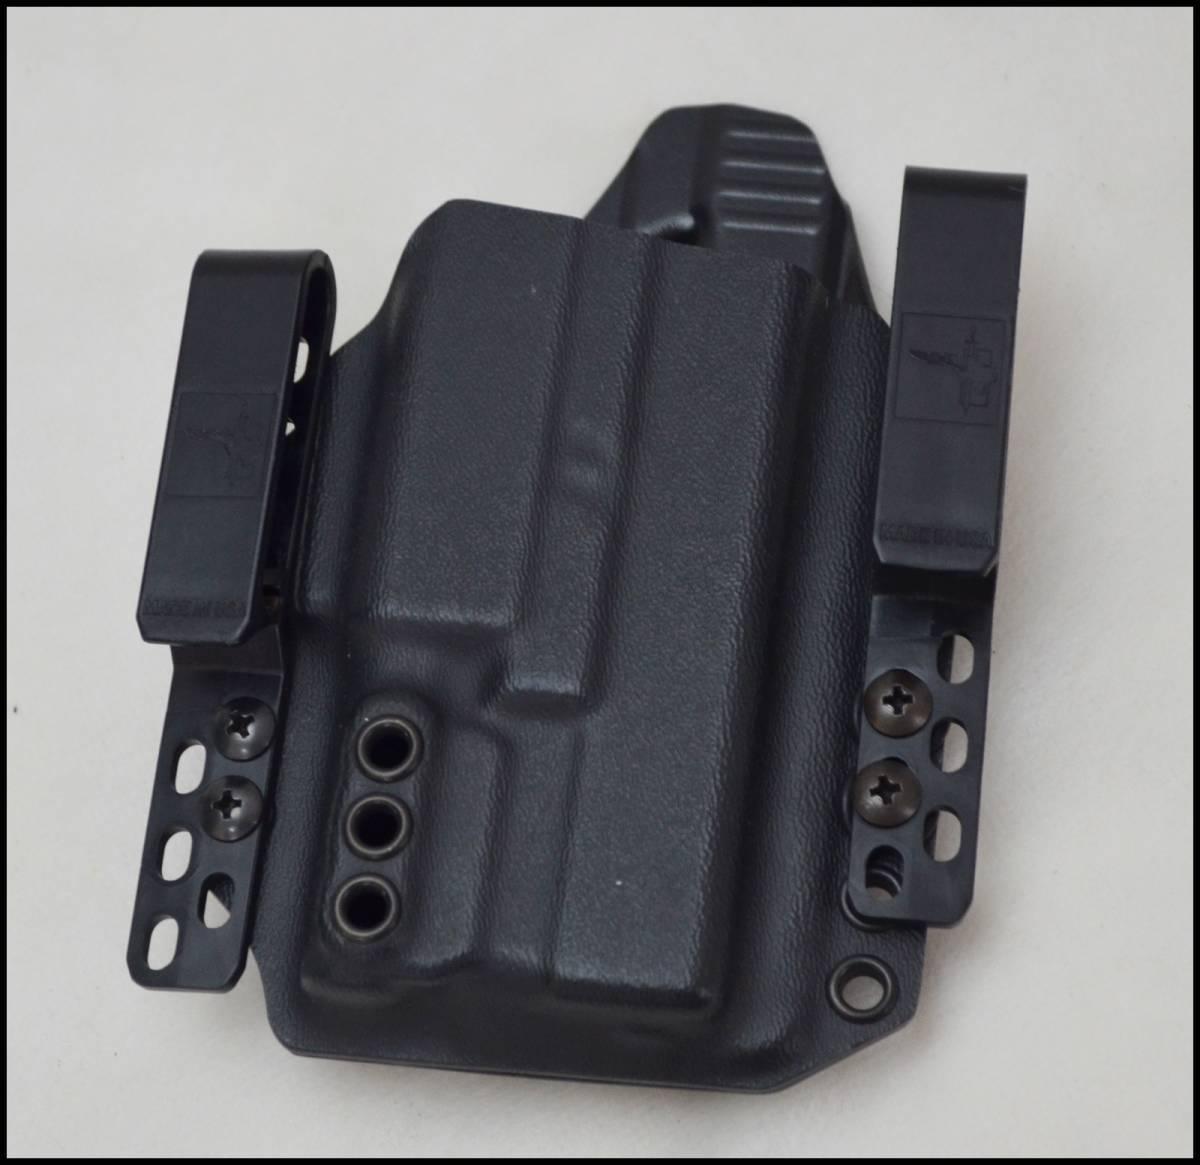 aff432b435a3 代購代標第一品牌- 樂淘letao - 未使用Bravo Concealment ホルスターGLOCK19用グロック19